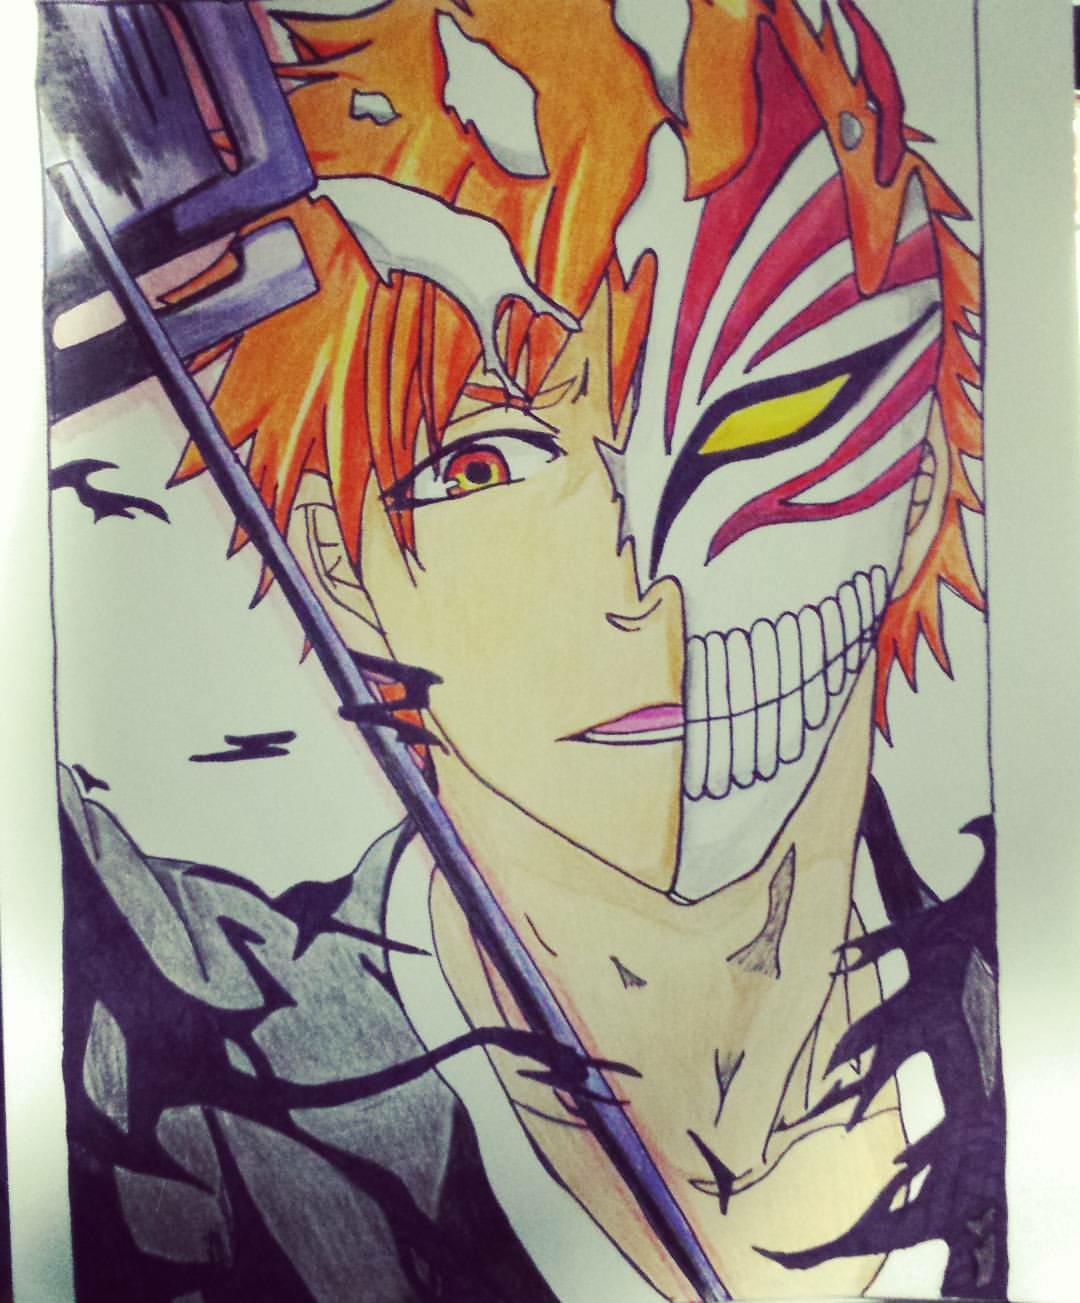 My drawing of Hollow Ichigo